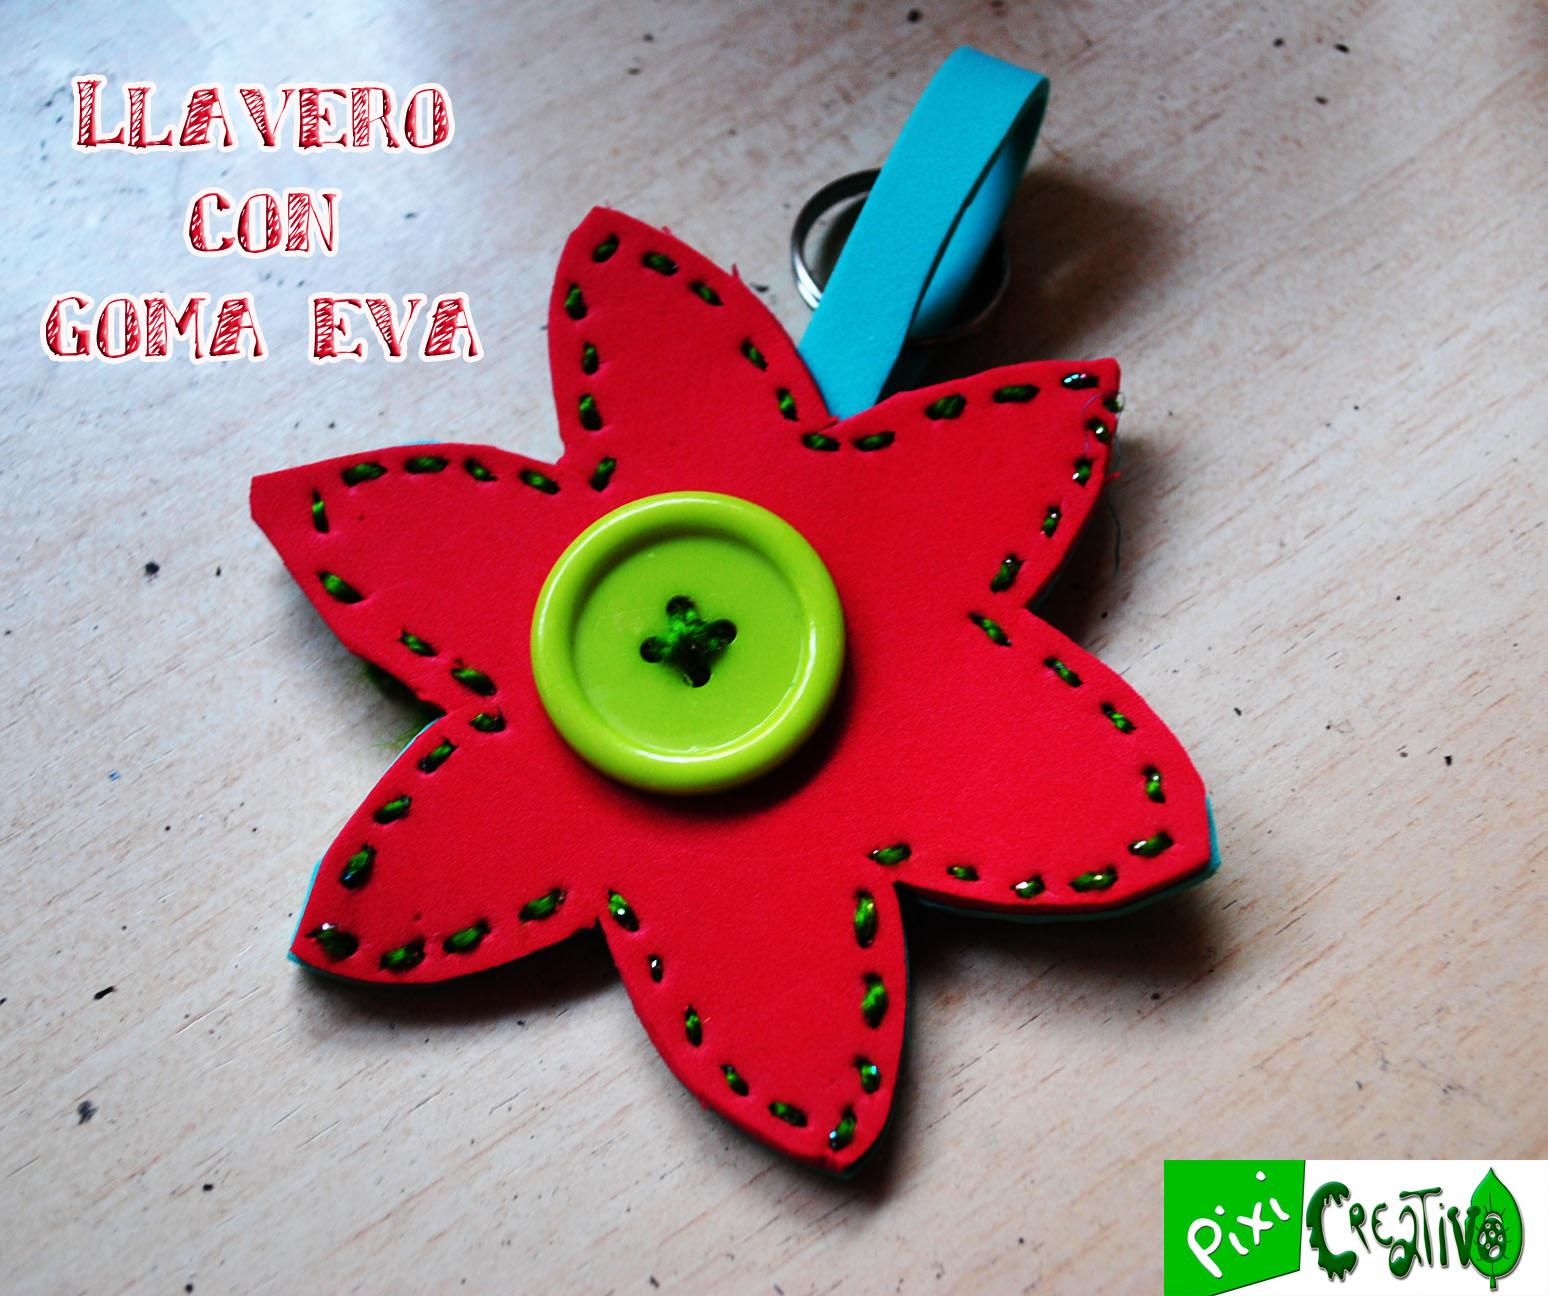 Pixicreativo: Llavero de Flor con Goma Eva